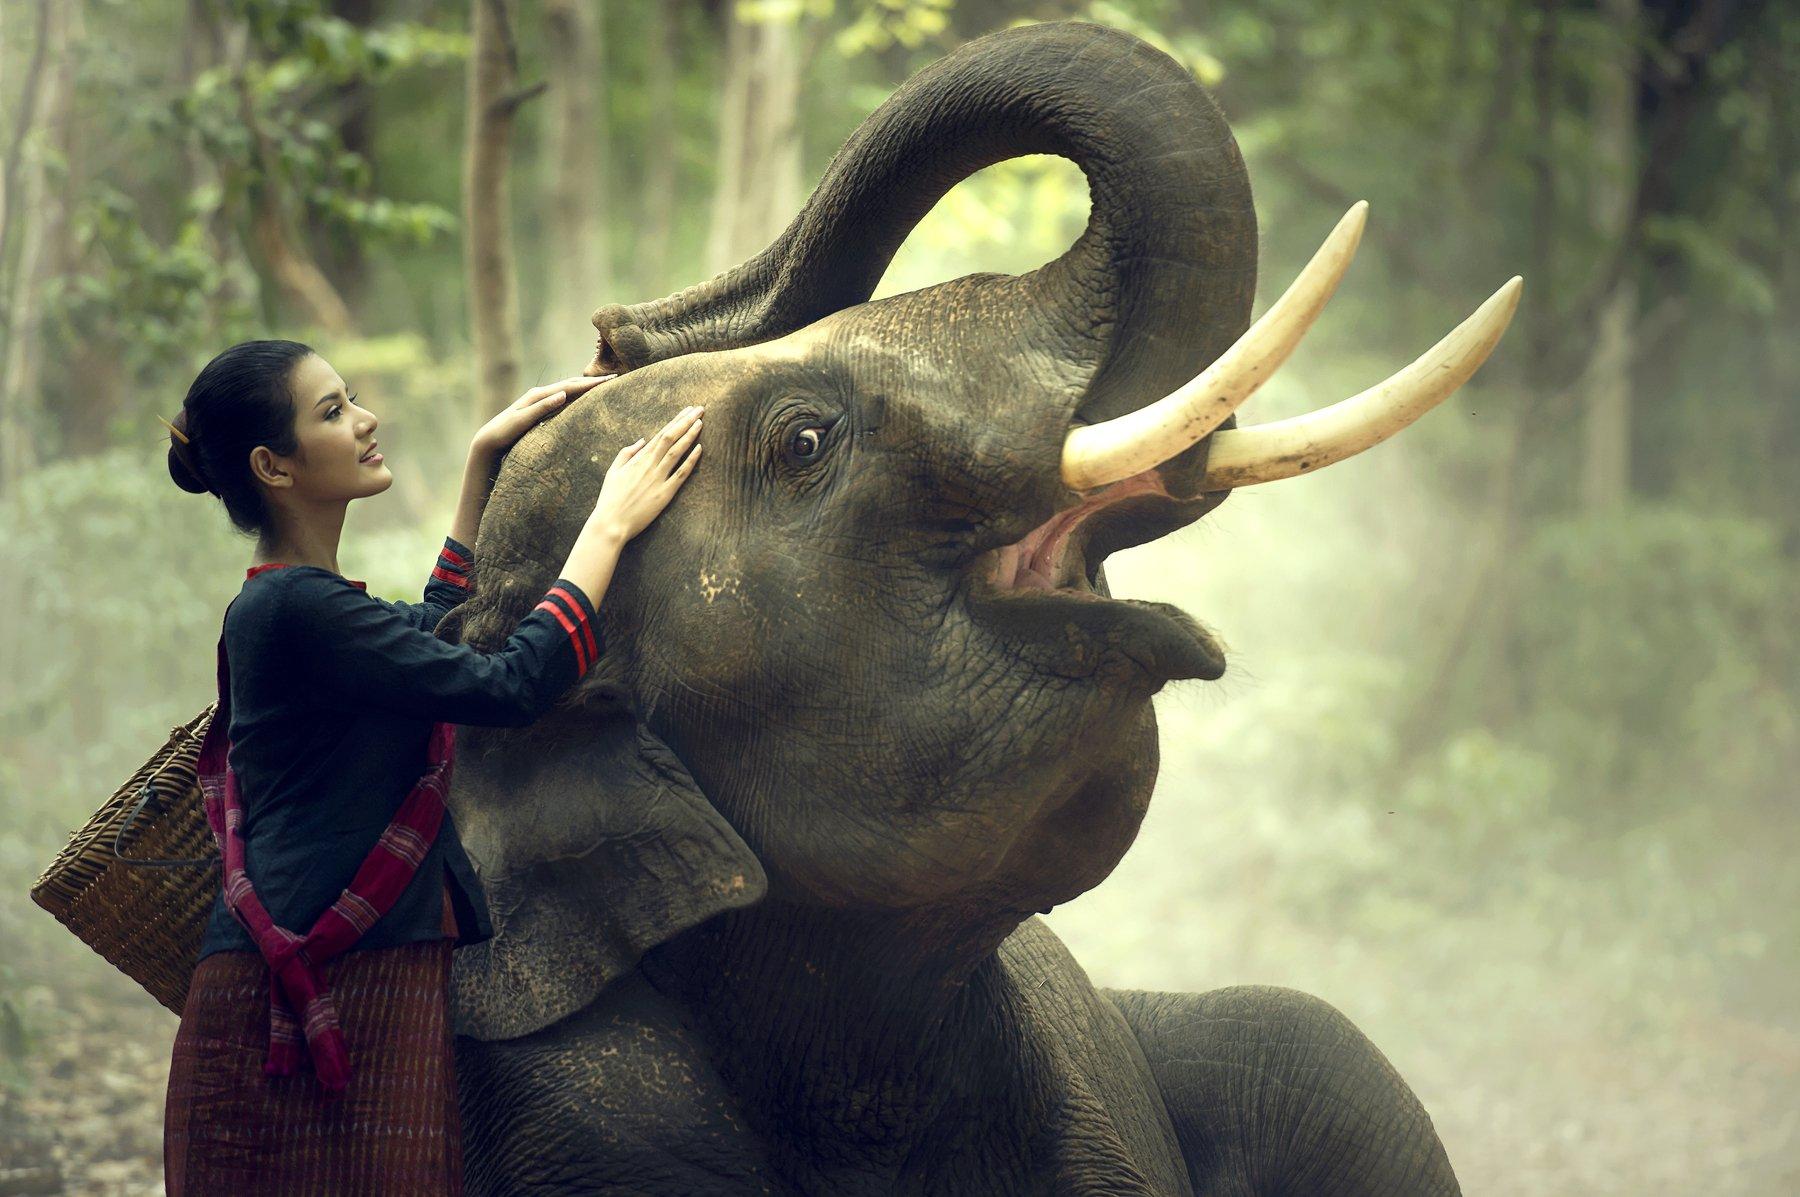 elelphant,portrait,woman,tradition,asia,laos,cambodia,thailand,beautiful,, SUTIPORN SOMNAM